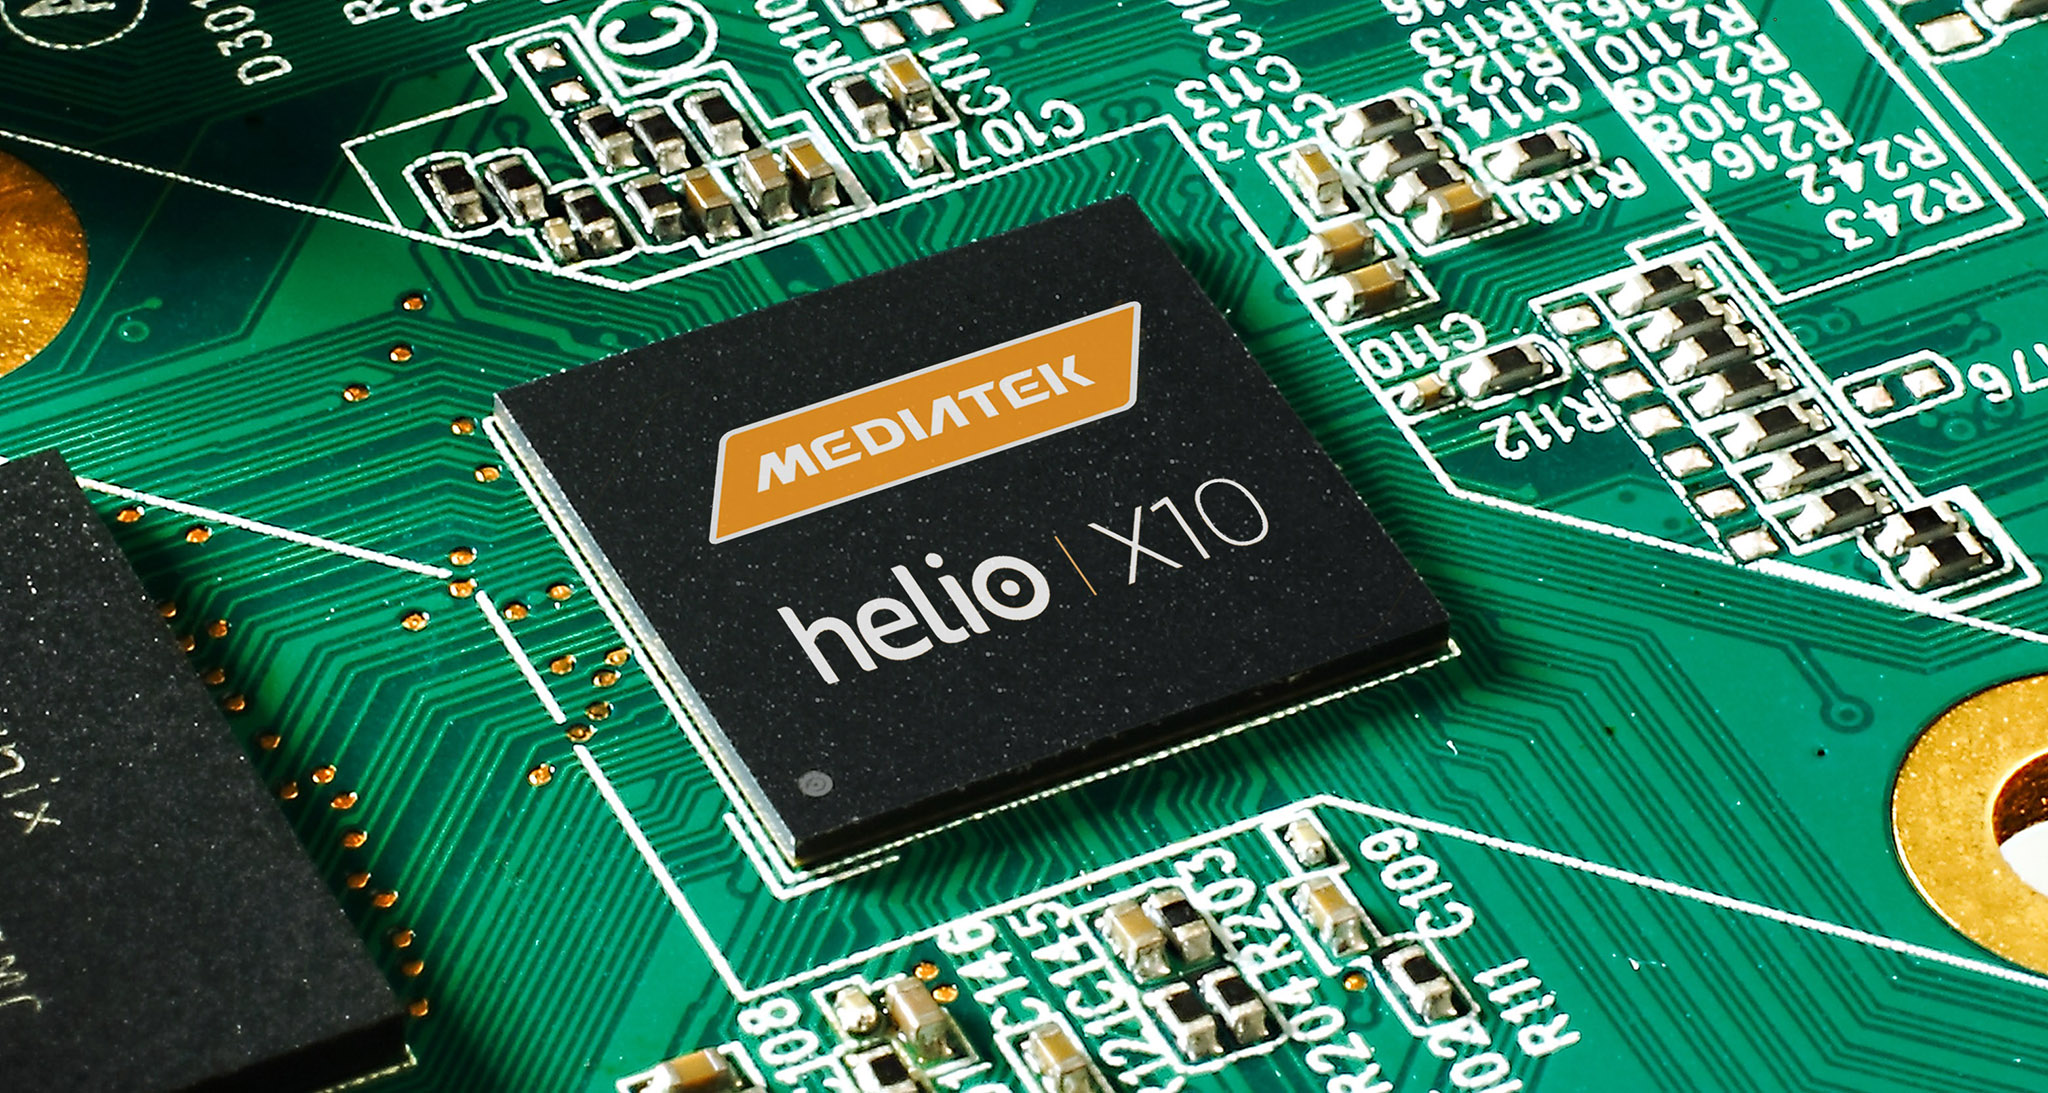 MediaTek-Helio-X10-chip.jpg